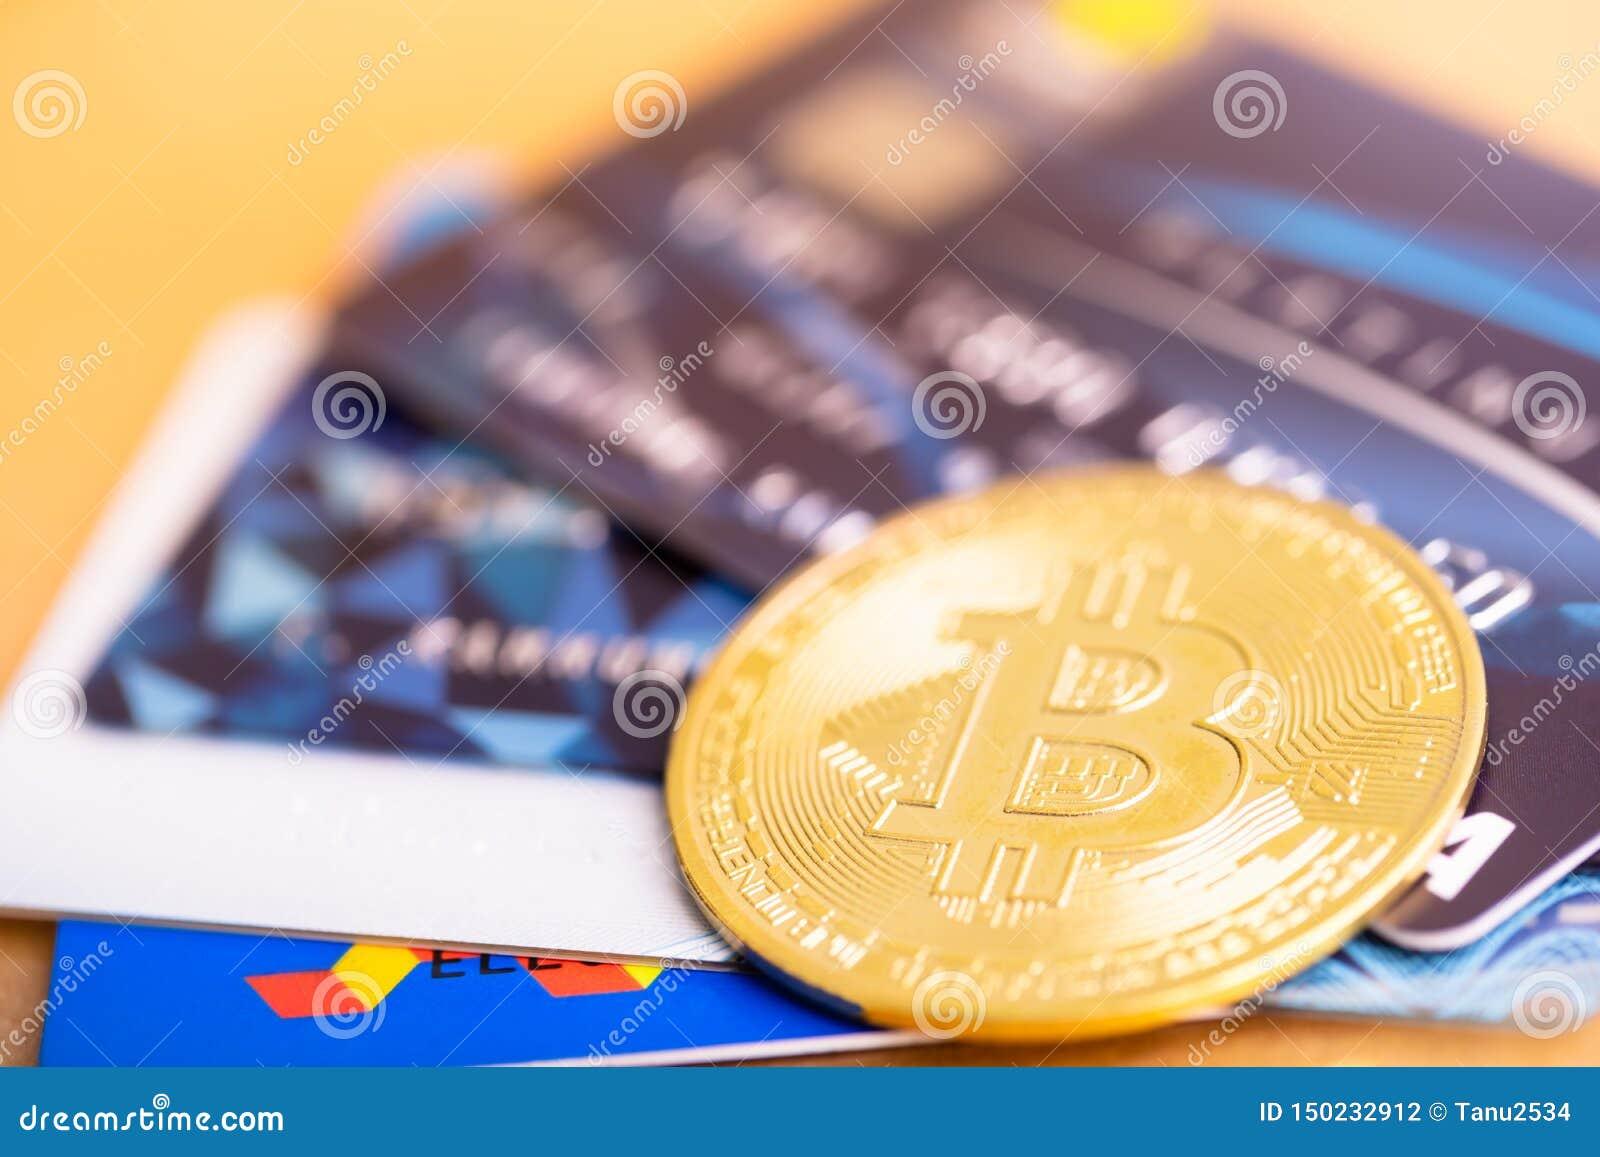 buy bitcoin with virtual visa